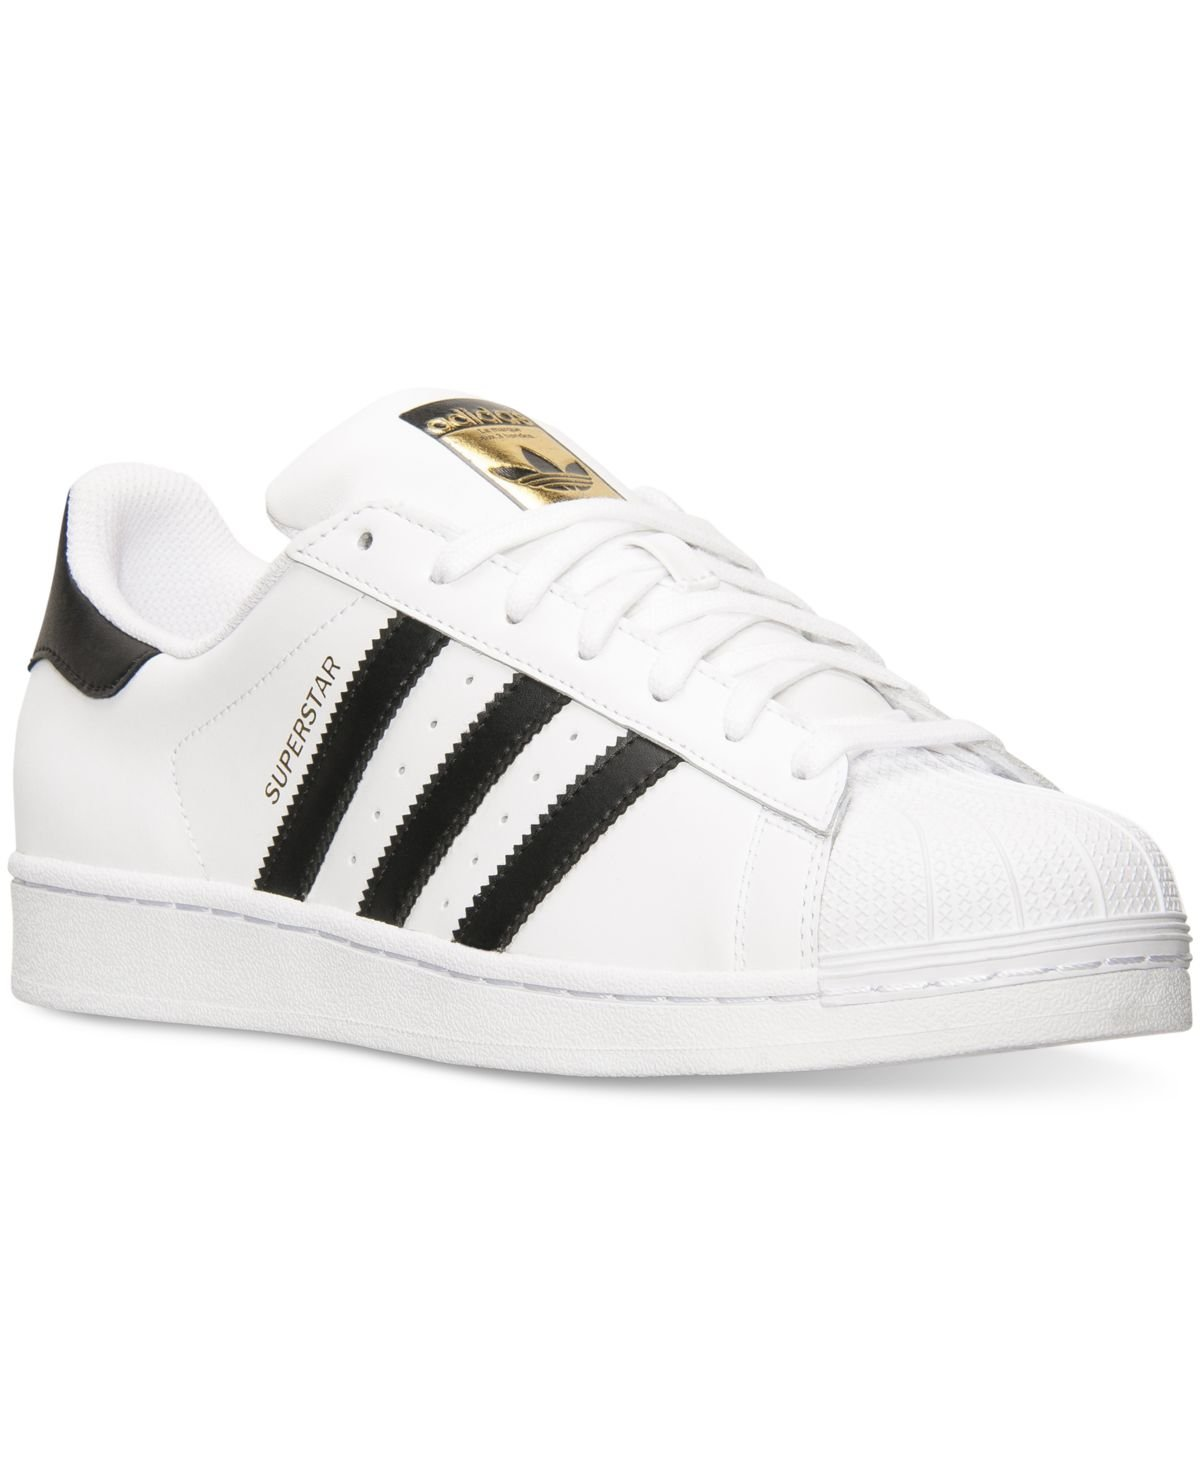 adidas Originals Men's Superstar Casual Sneaker, White/Core Black/White, 9.5 M US